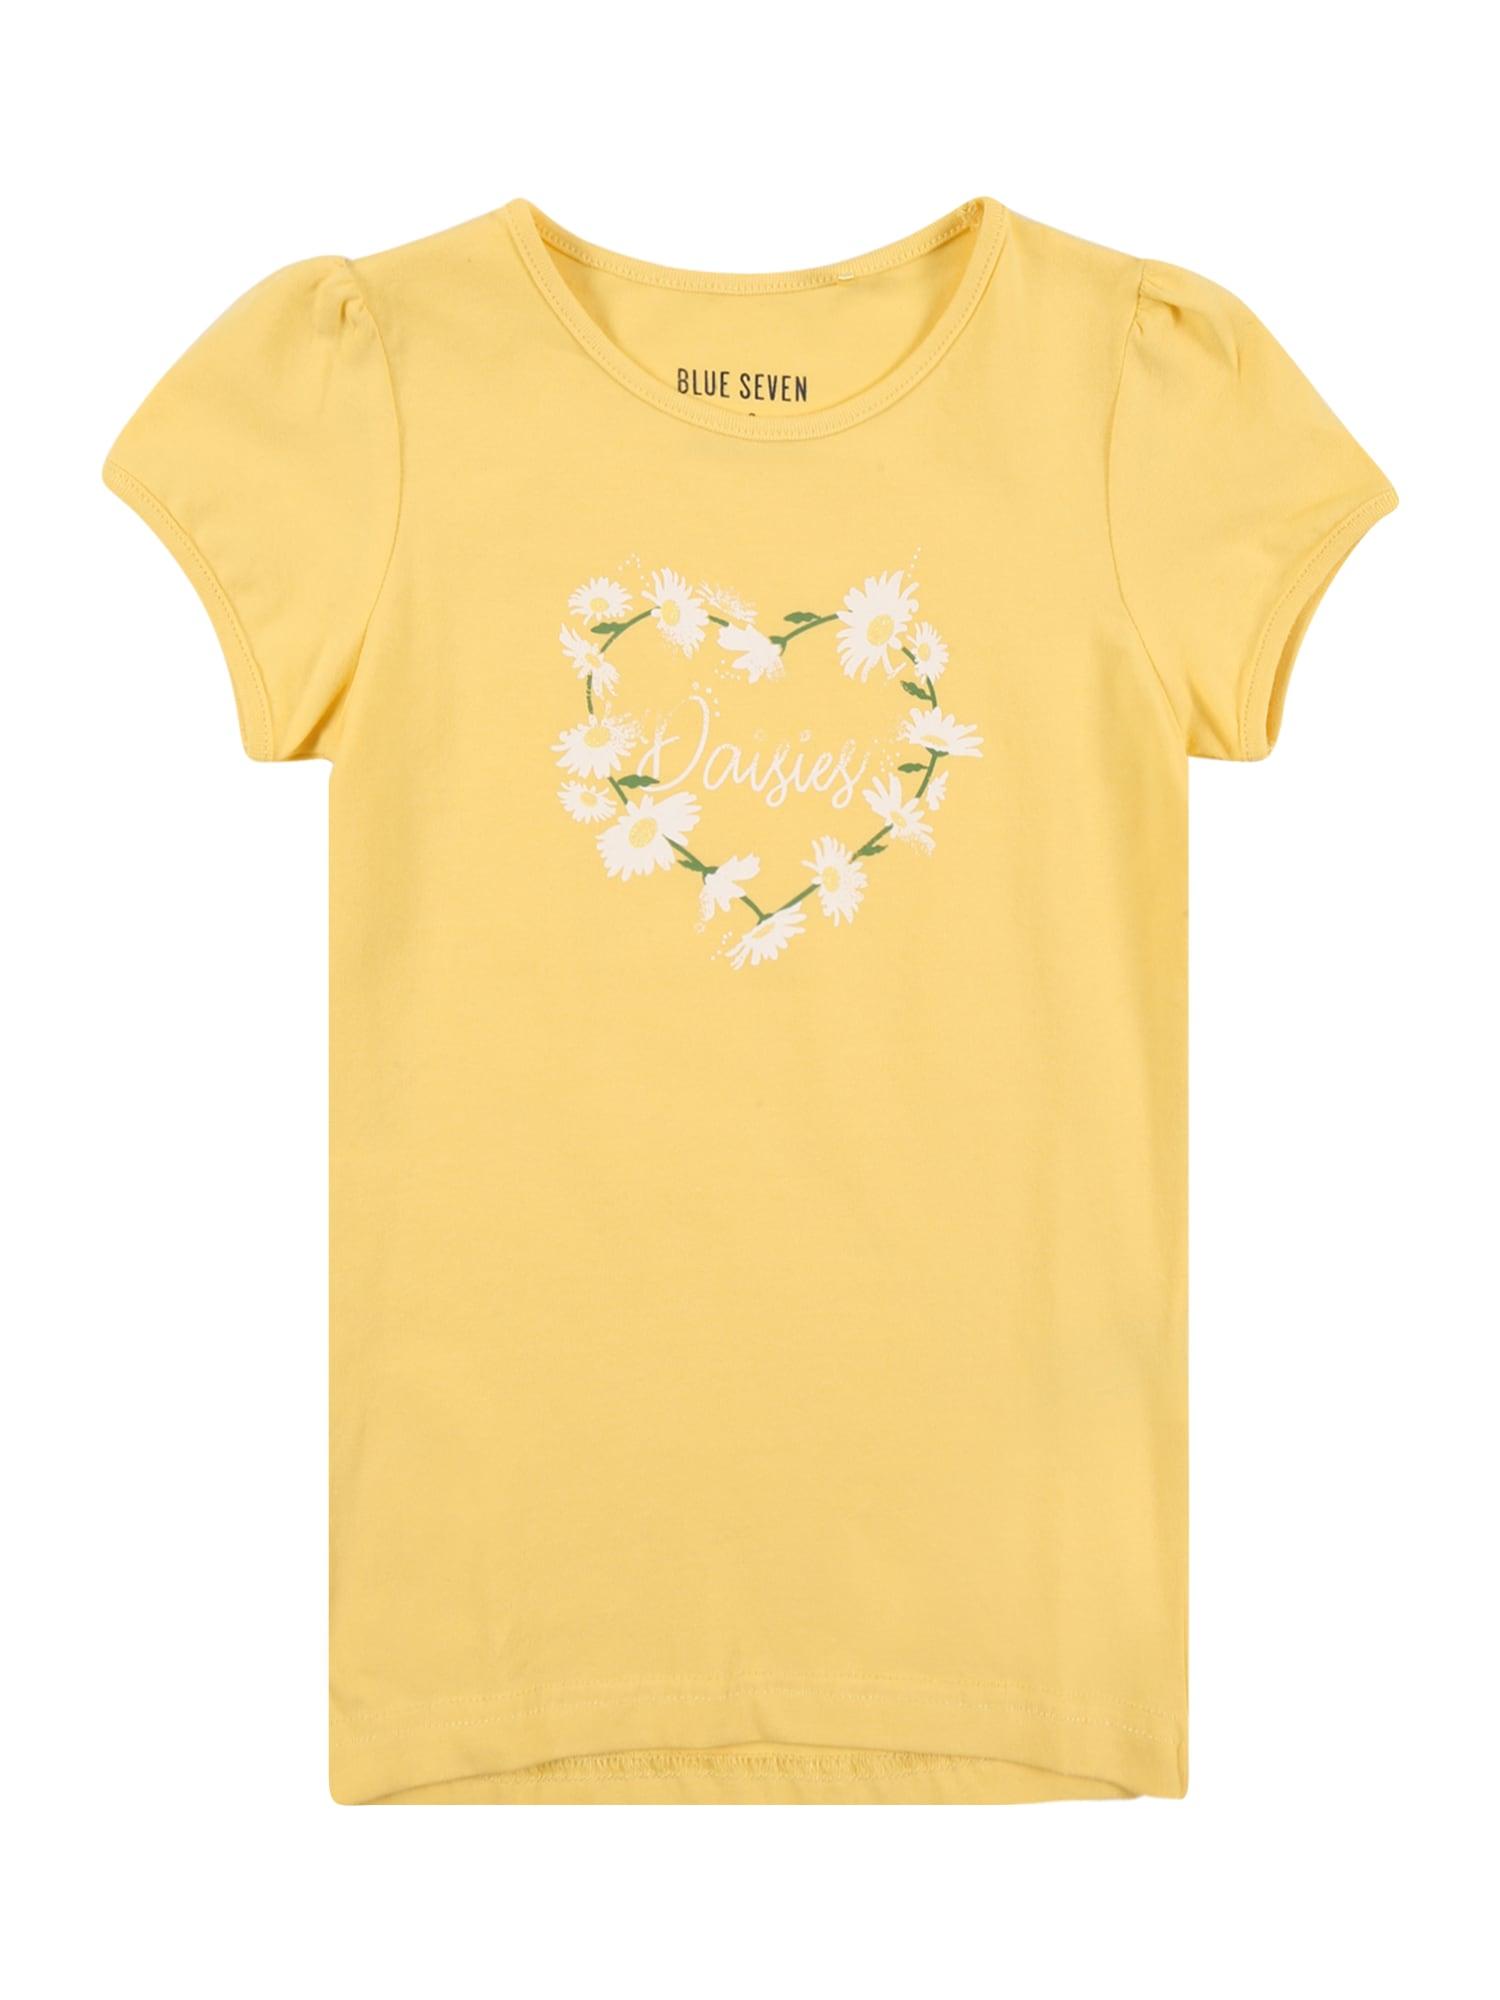 BLUE SEVEN Marškinėliai geltona / balta / žalia